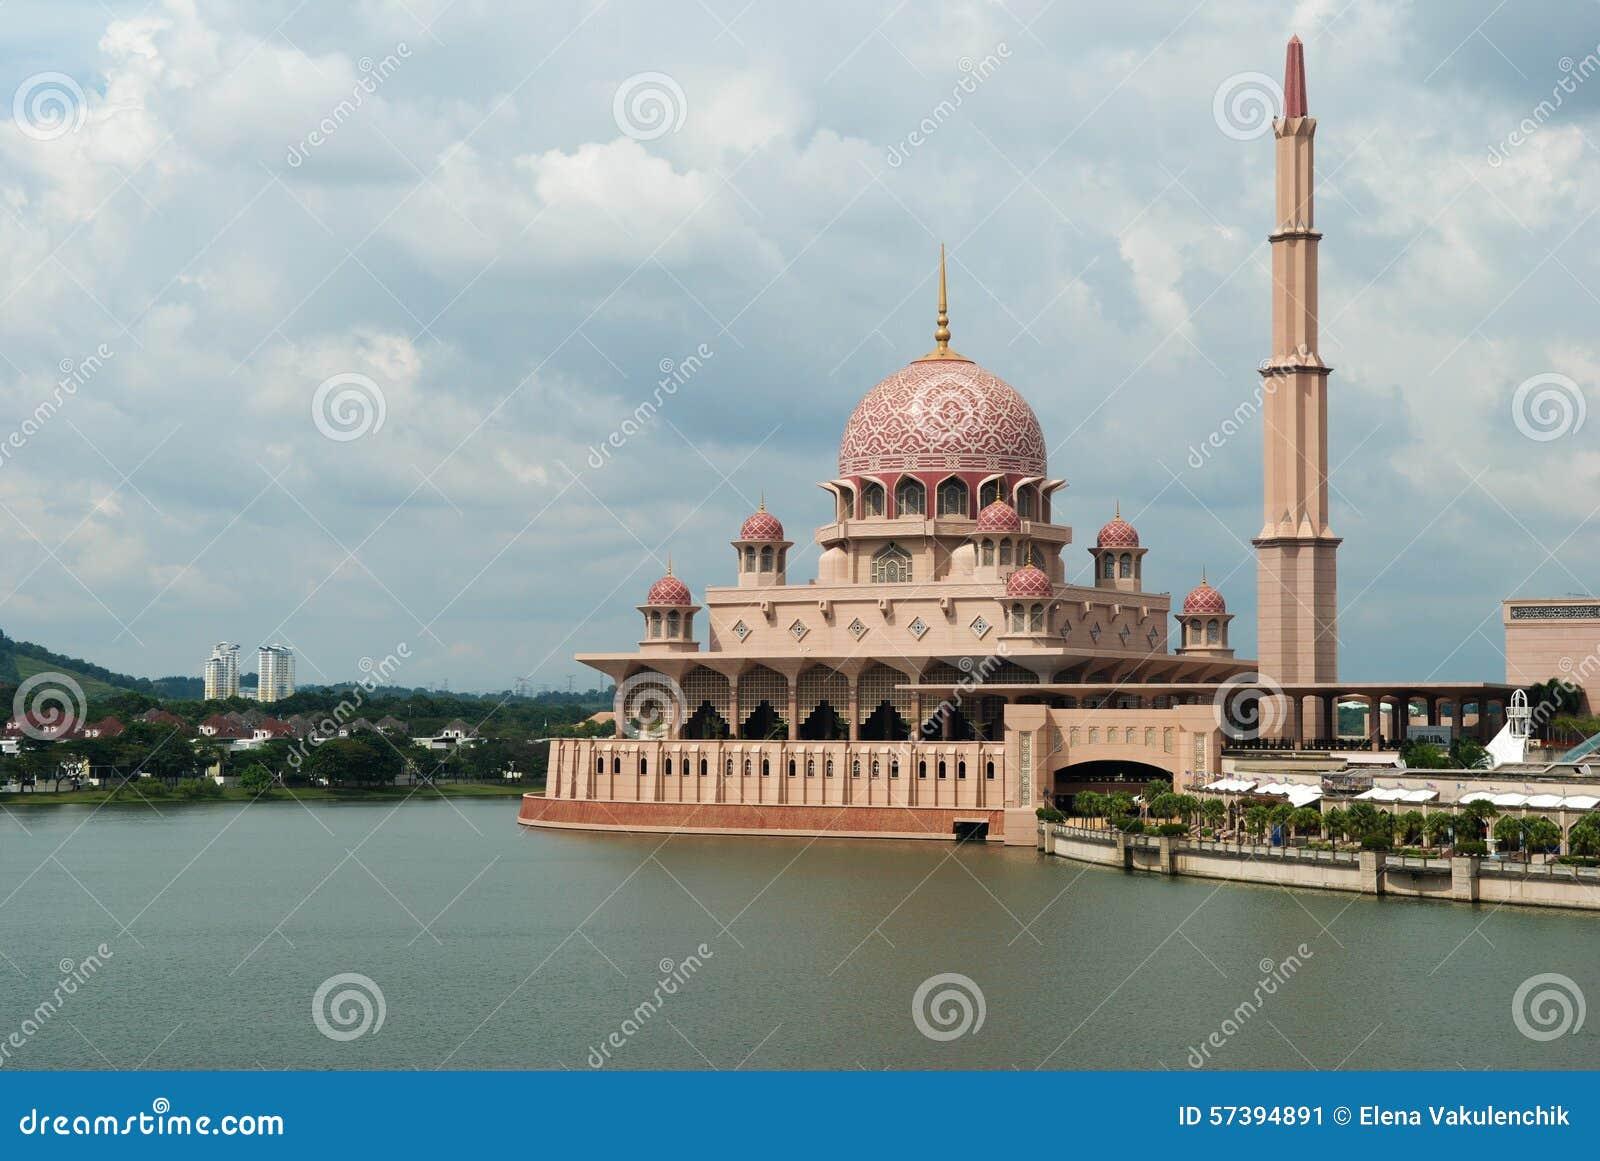 Putrajaya, administratief centrum van Maleisië